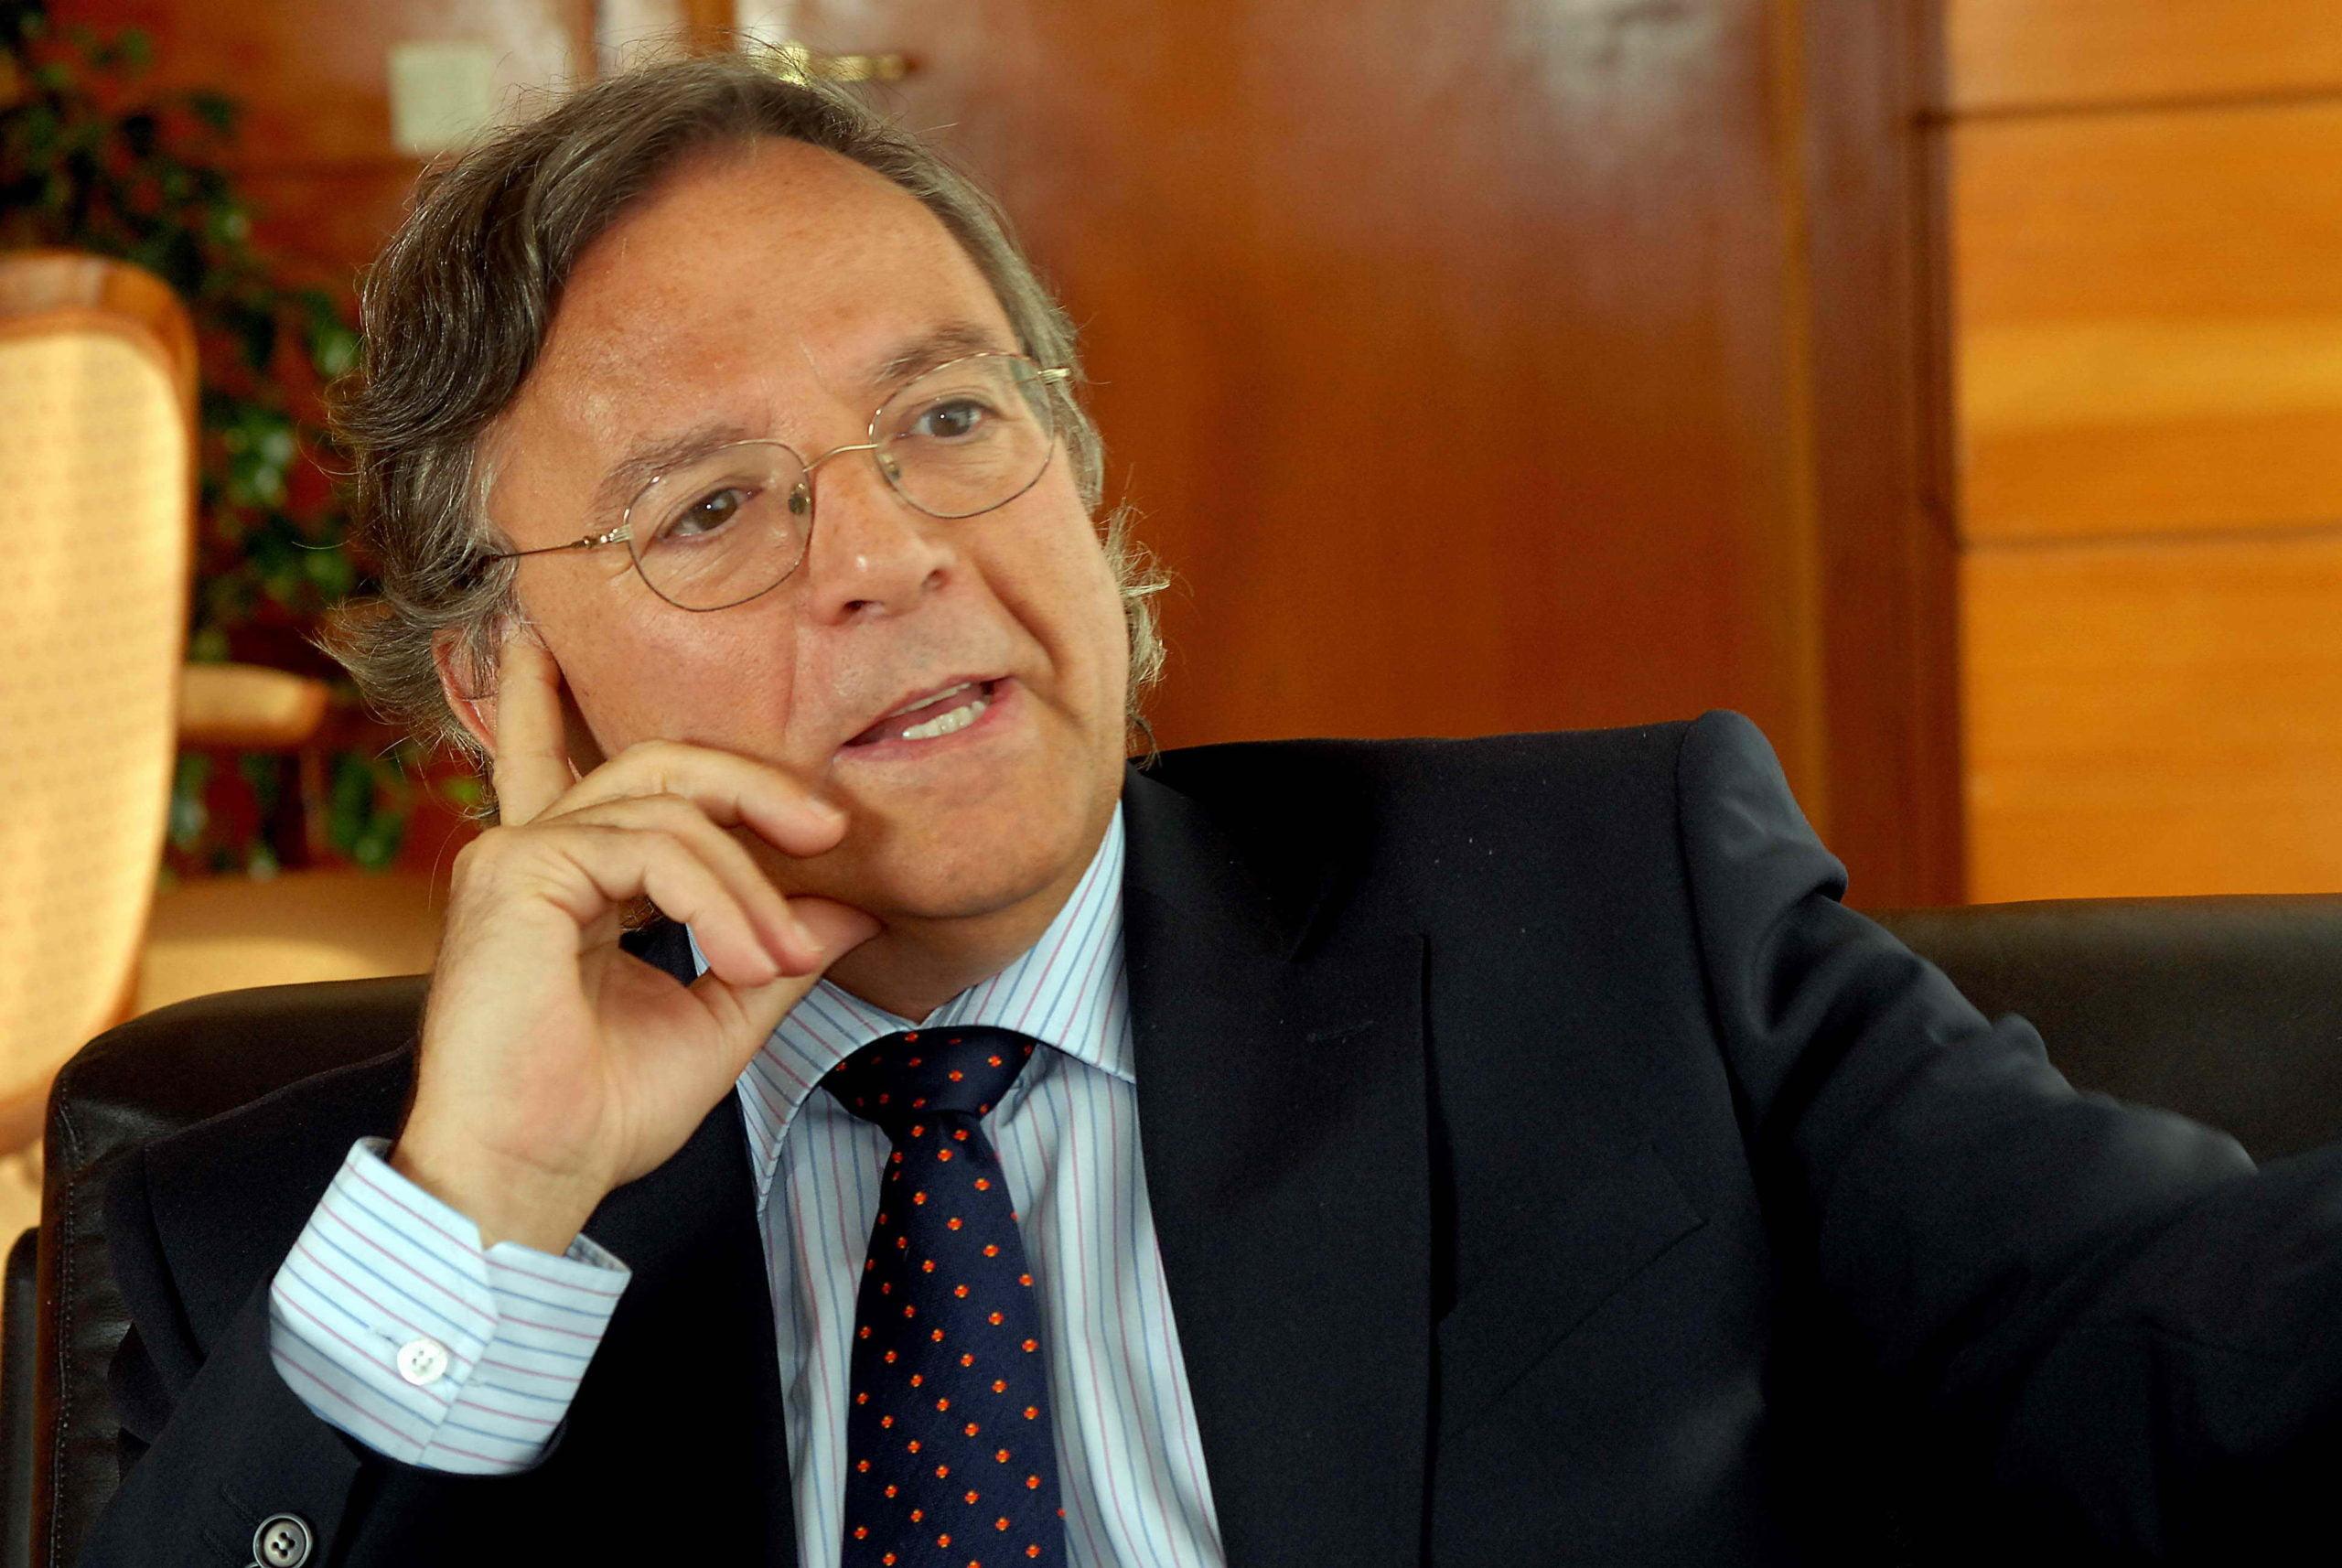 Dr. Daniel Peña Sánchez de Rivera